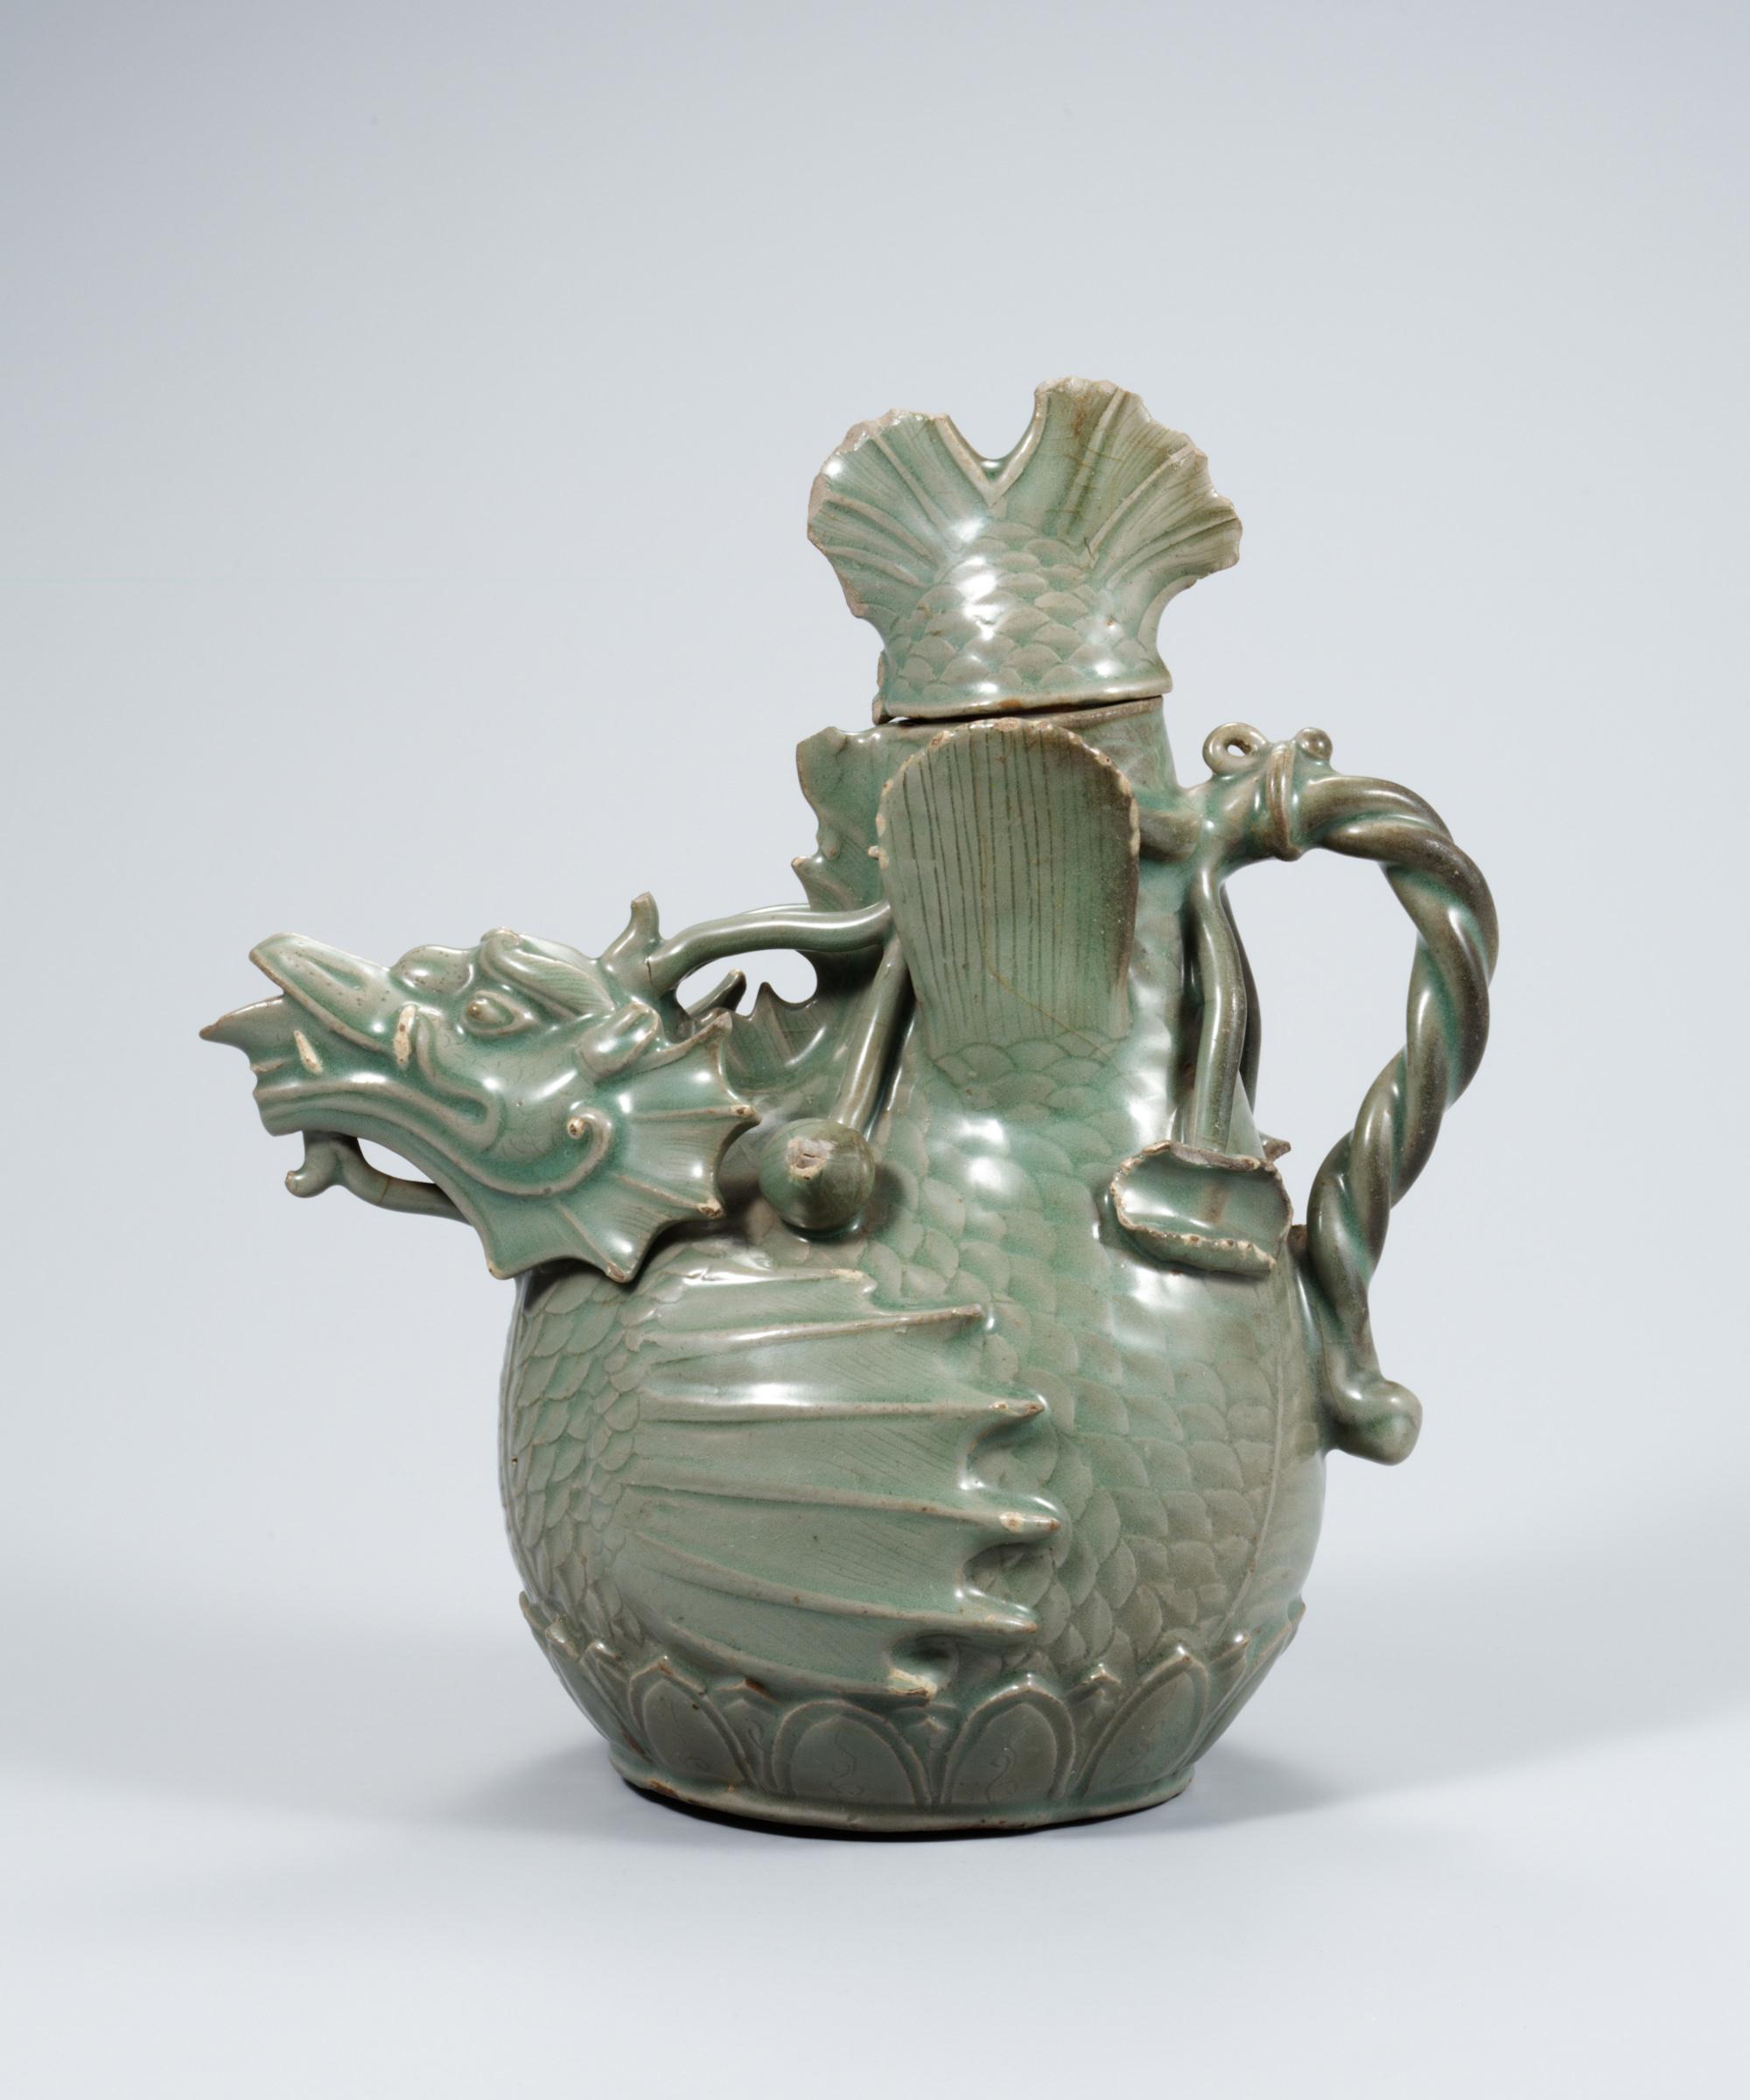 Celadon fish dragon ewer goryeo dynasty illustration ancient celadon fish dragon ewer goryeo dynasty reviewsmspy